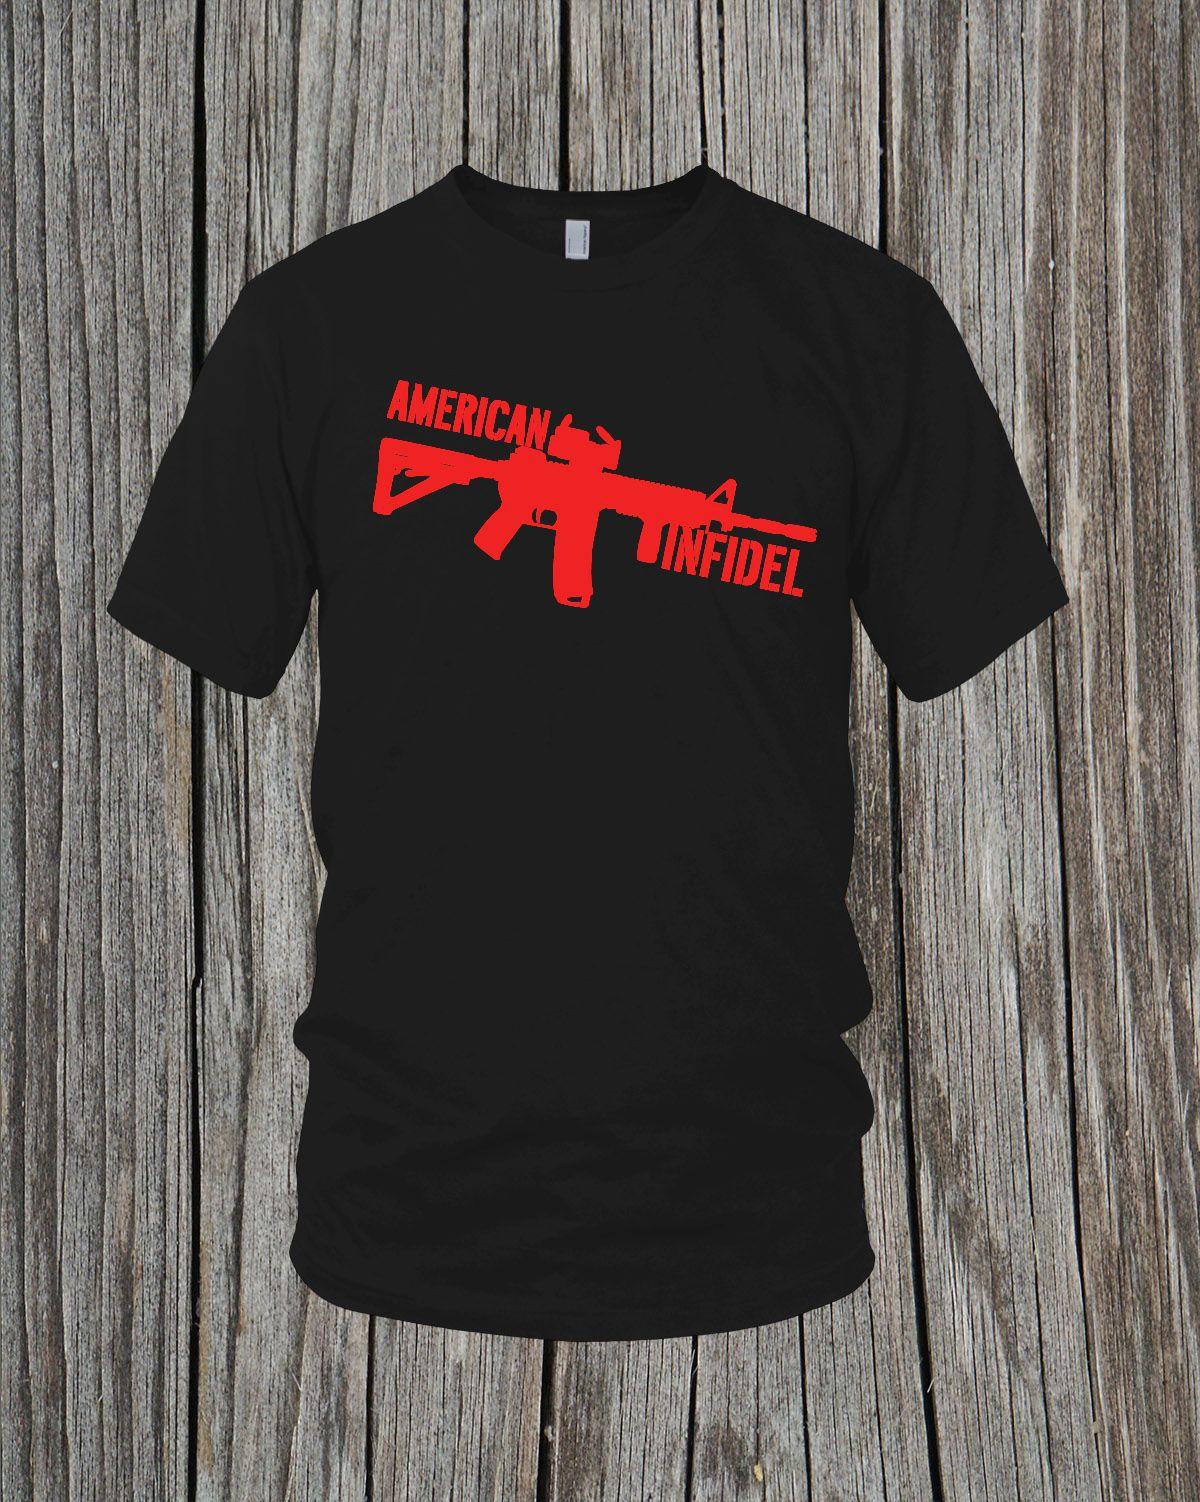 Kafir Shirt Mens T Shirt Black Gildan Shirt With Screen Printed